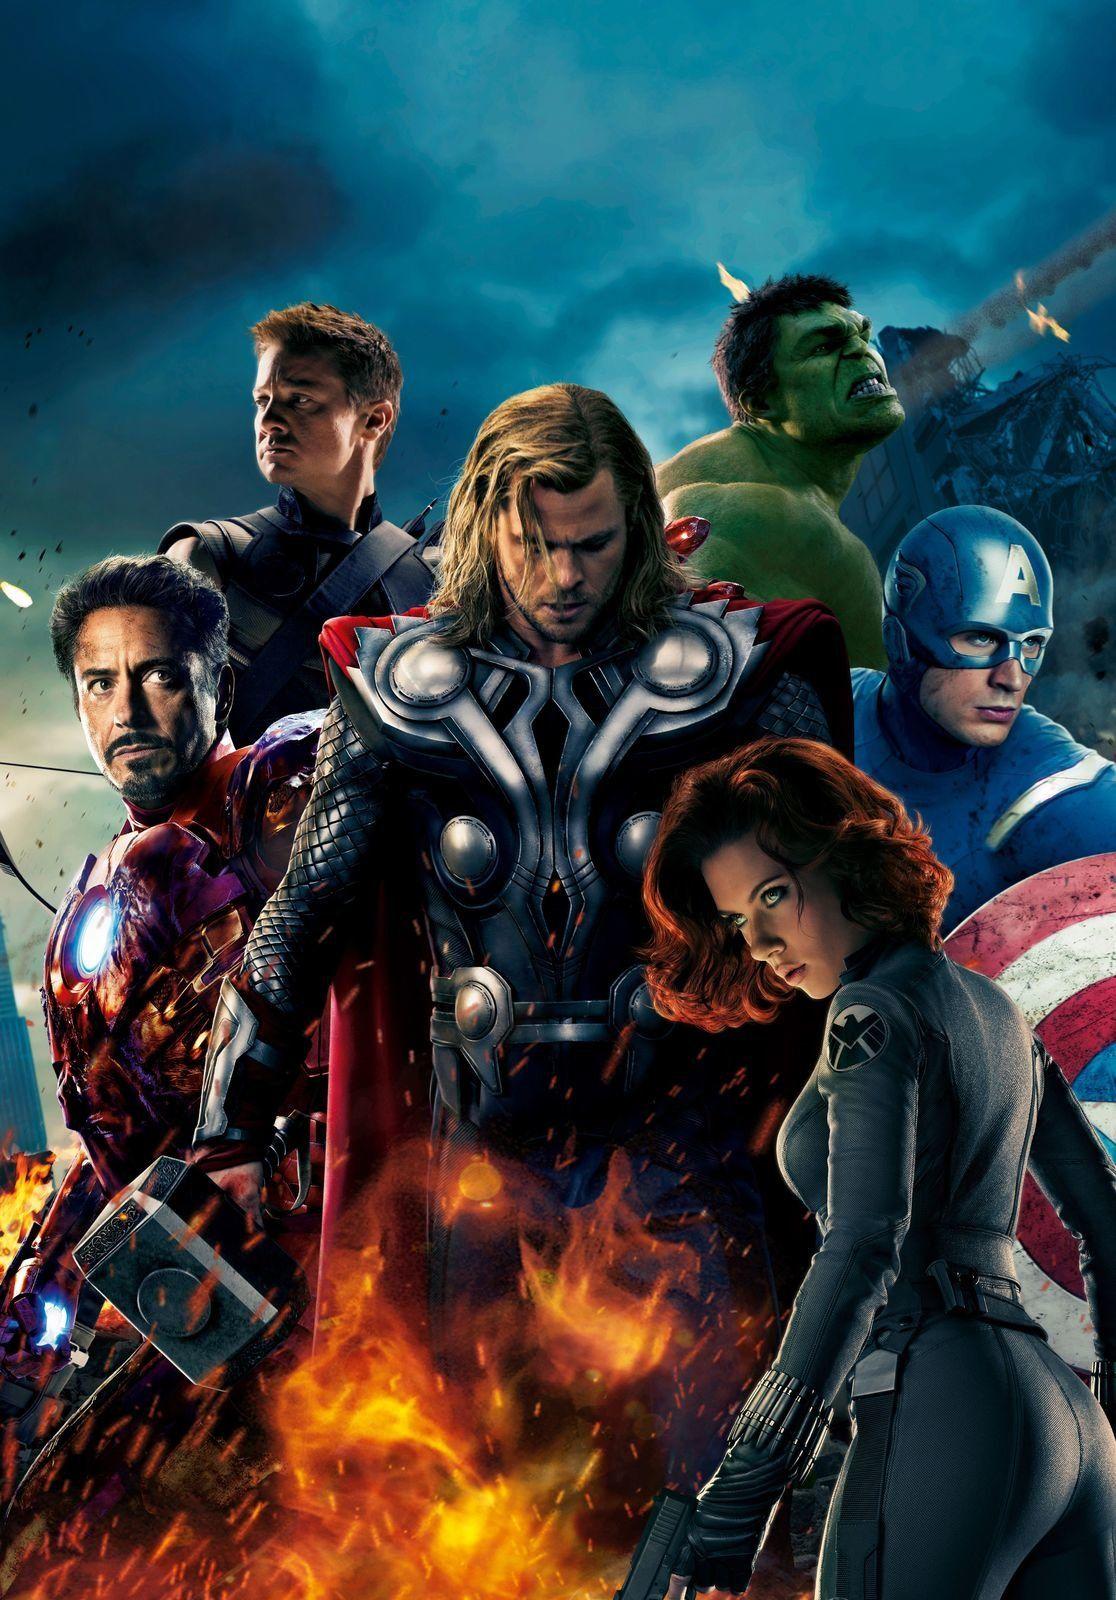 The Avengers 2012 v002 Movie Poster 27 x 40 on Wanelo